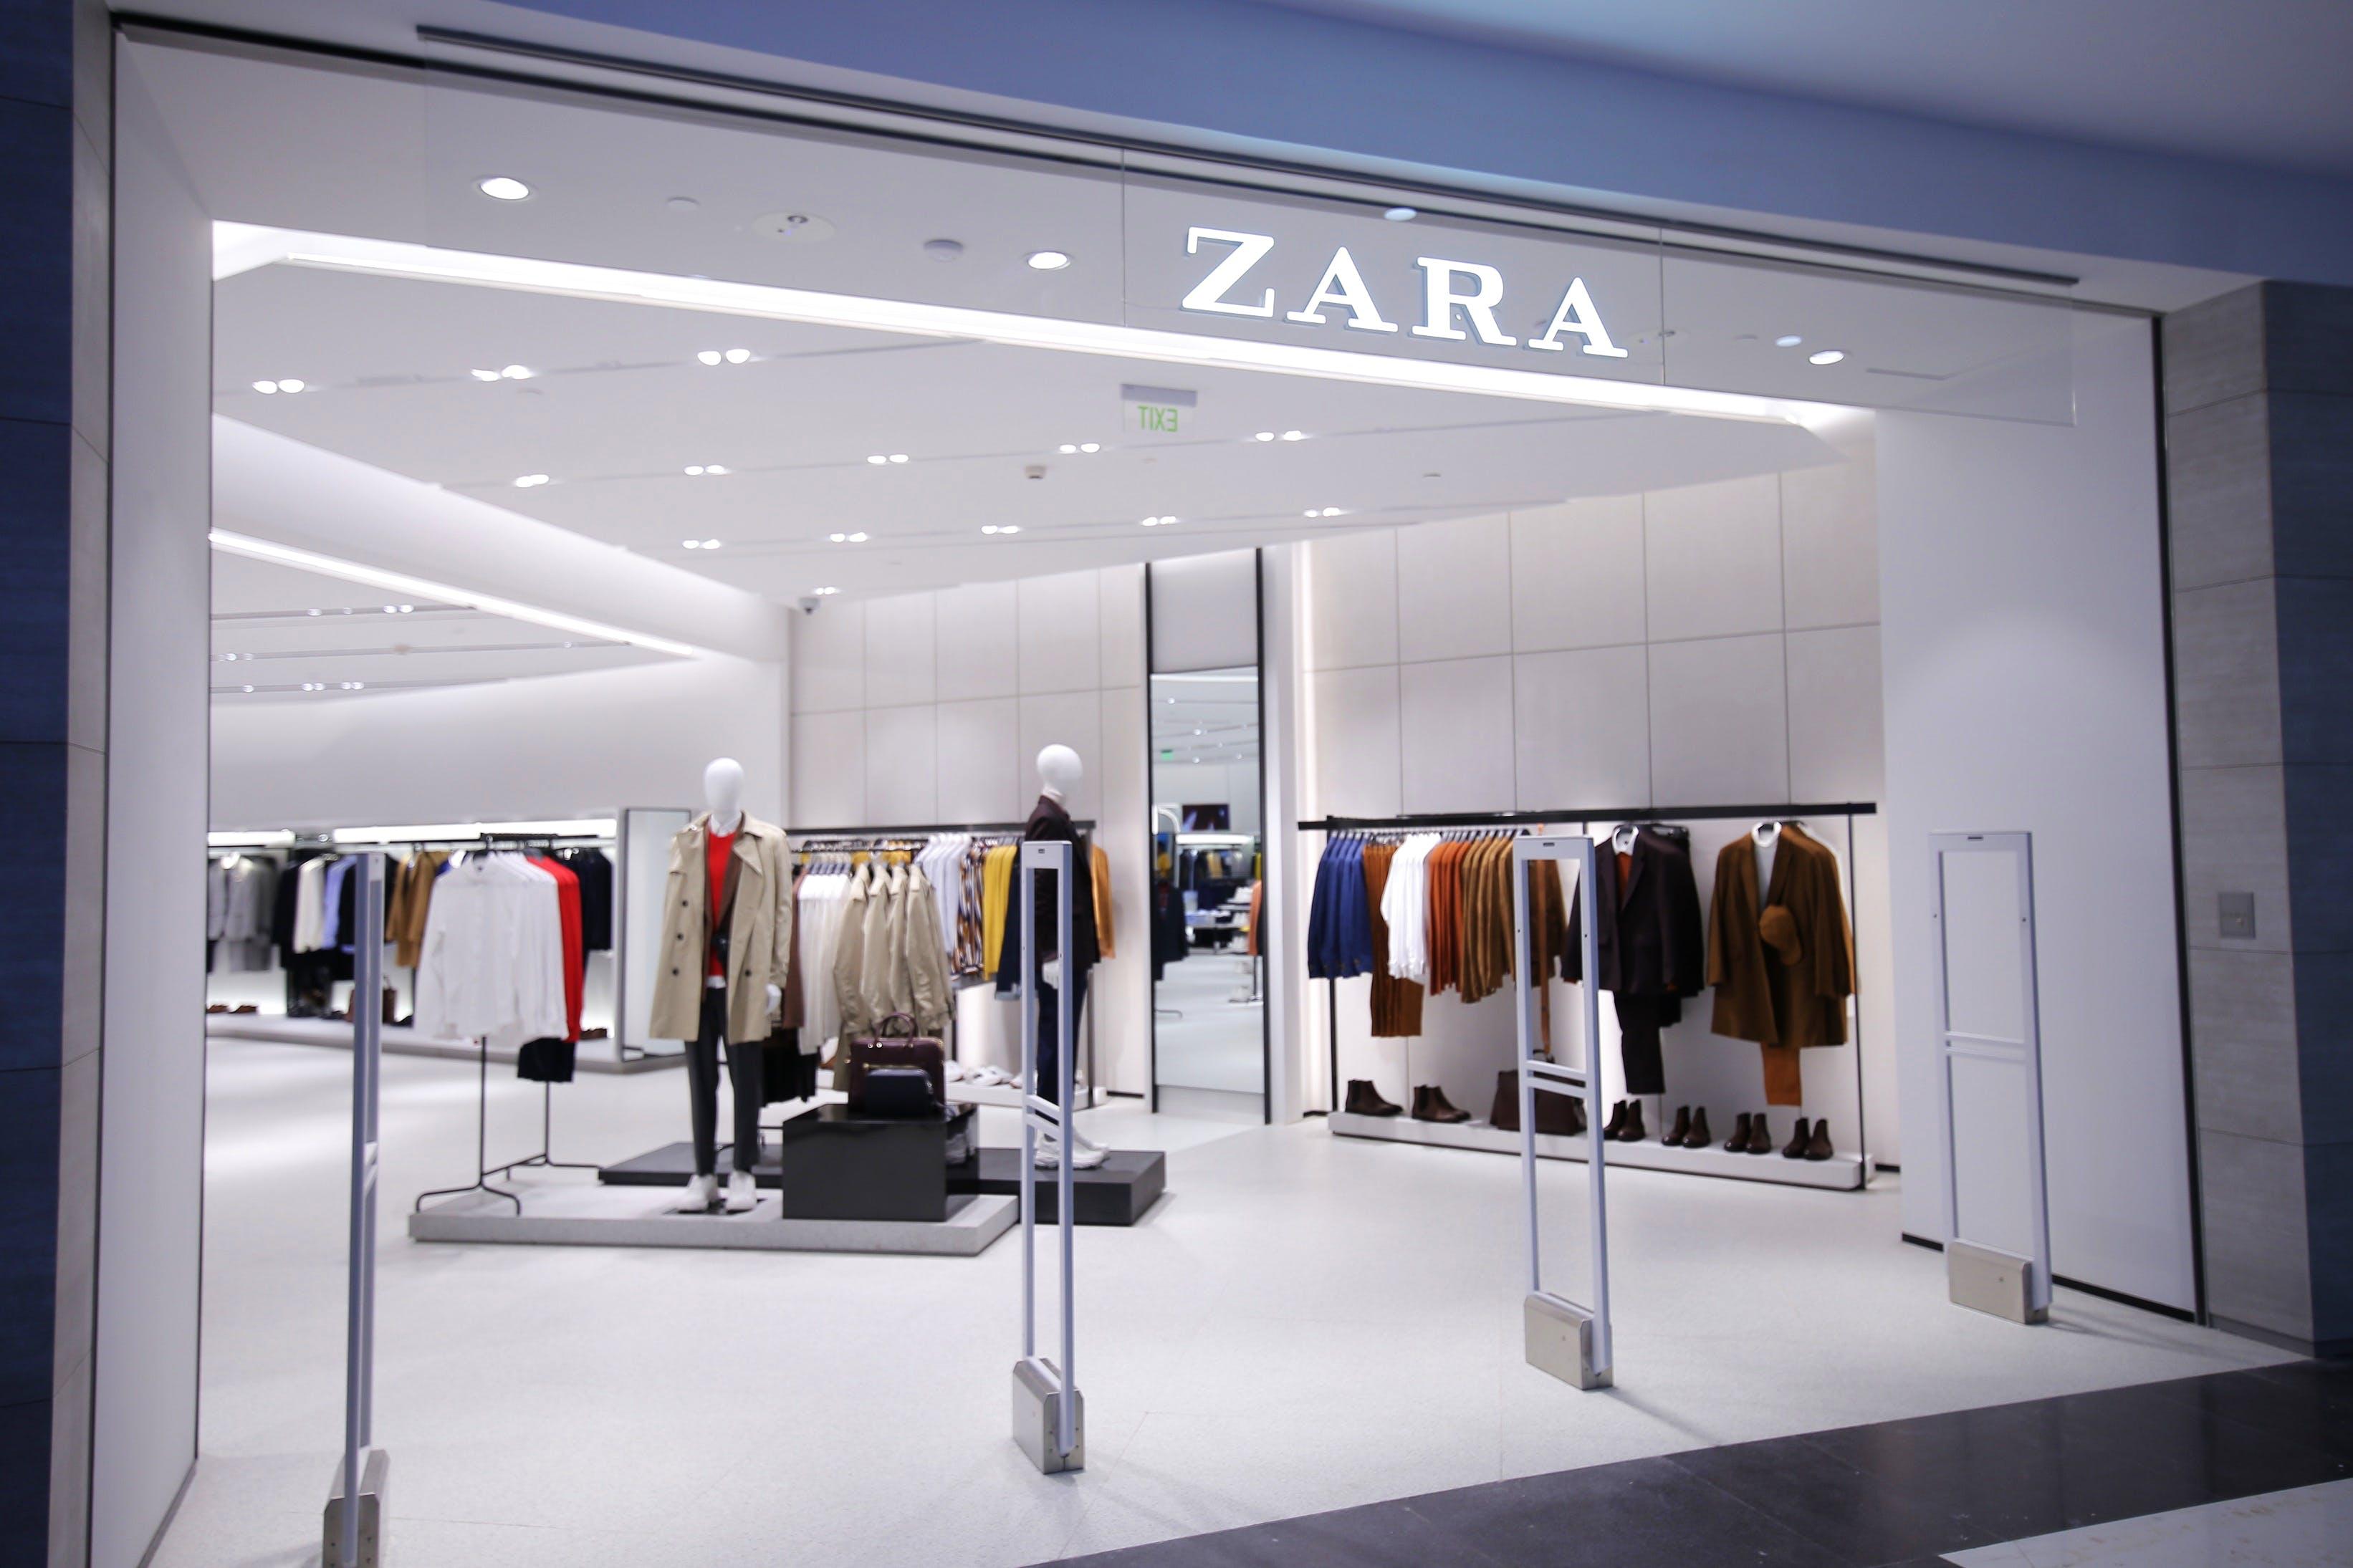 Zara Business Model